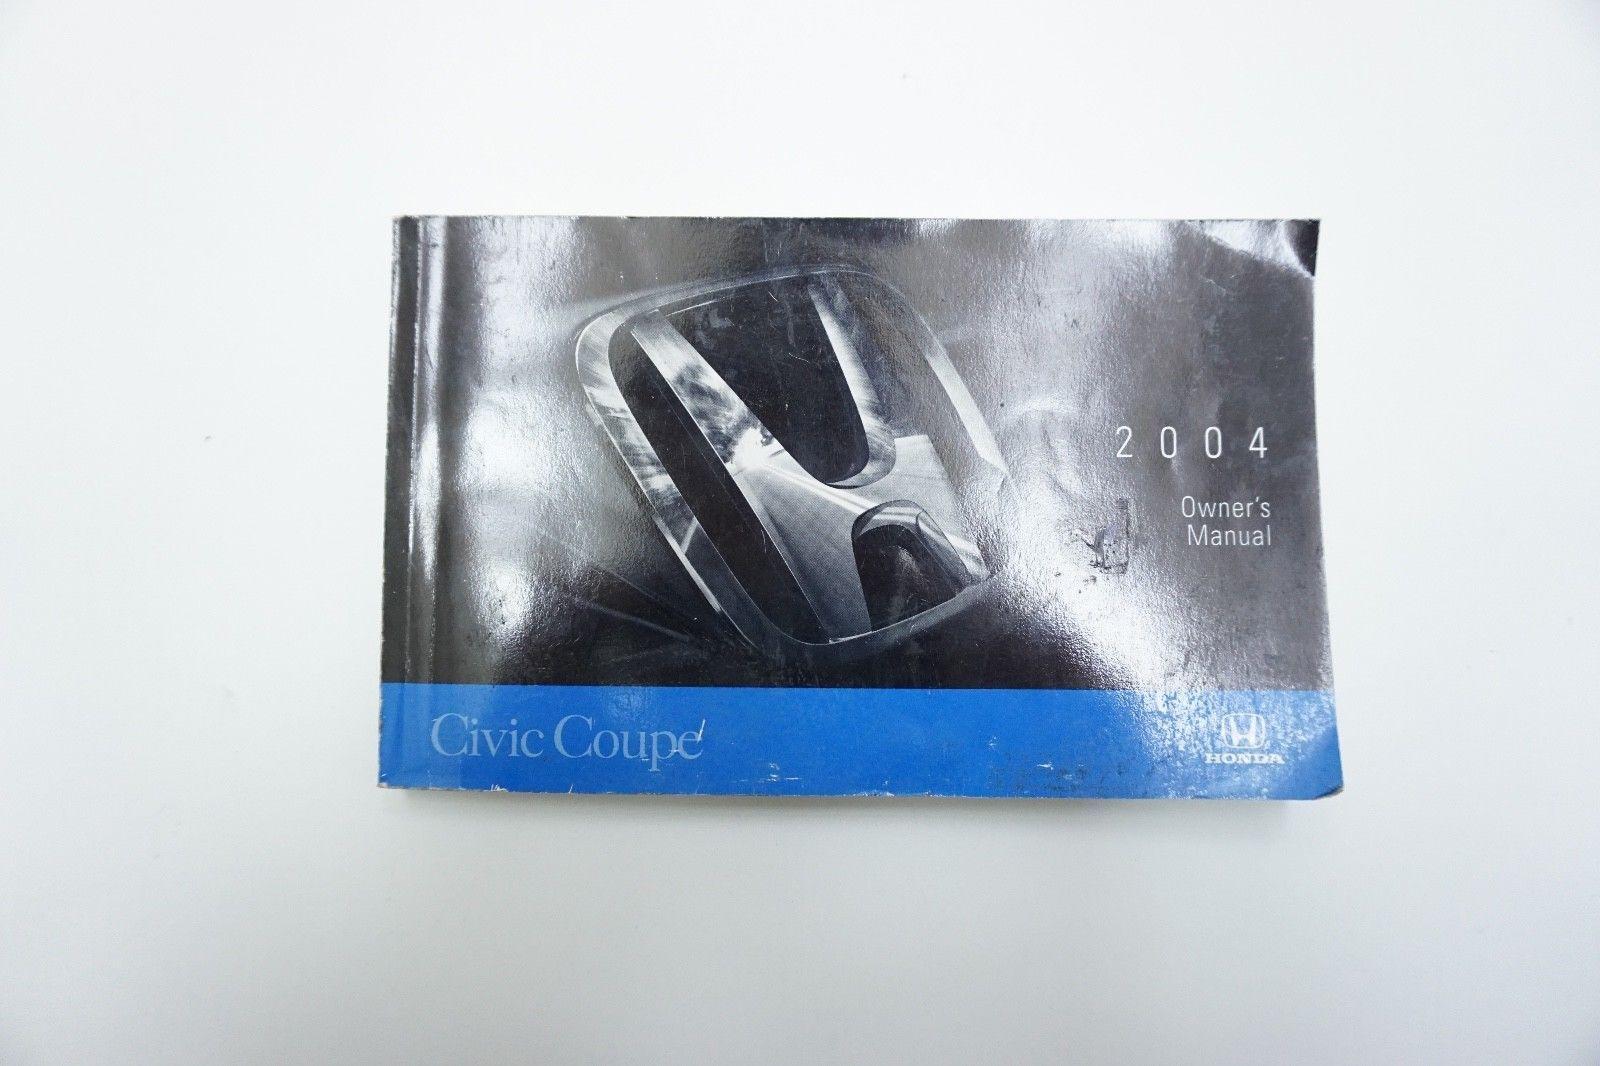 20032004 Honda Civic Hybrid Electrical Troubleshooting Manual Orig